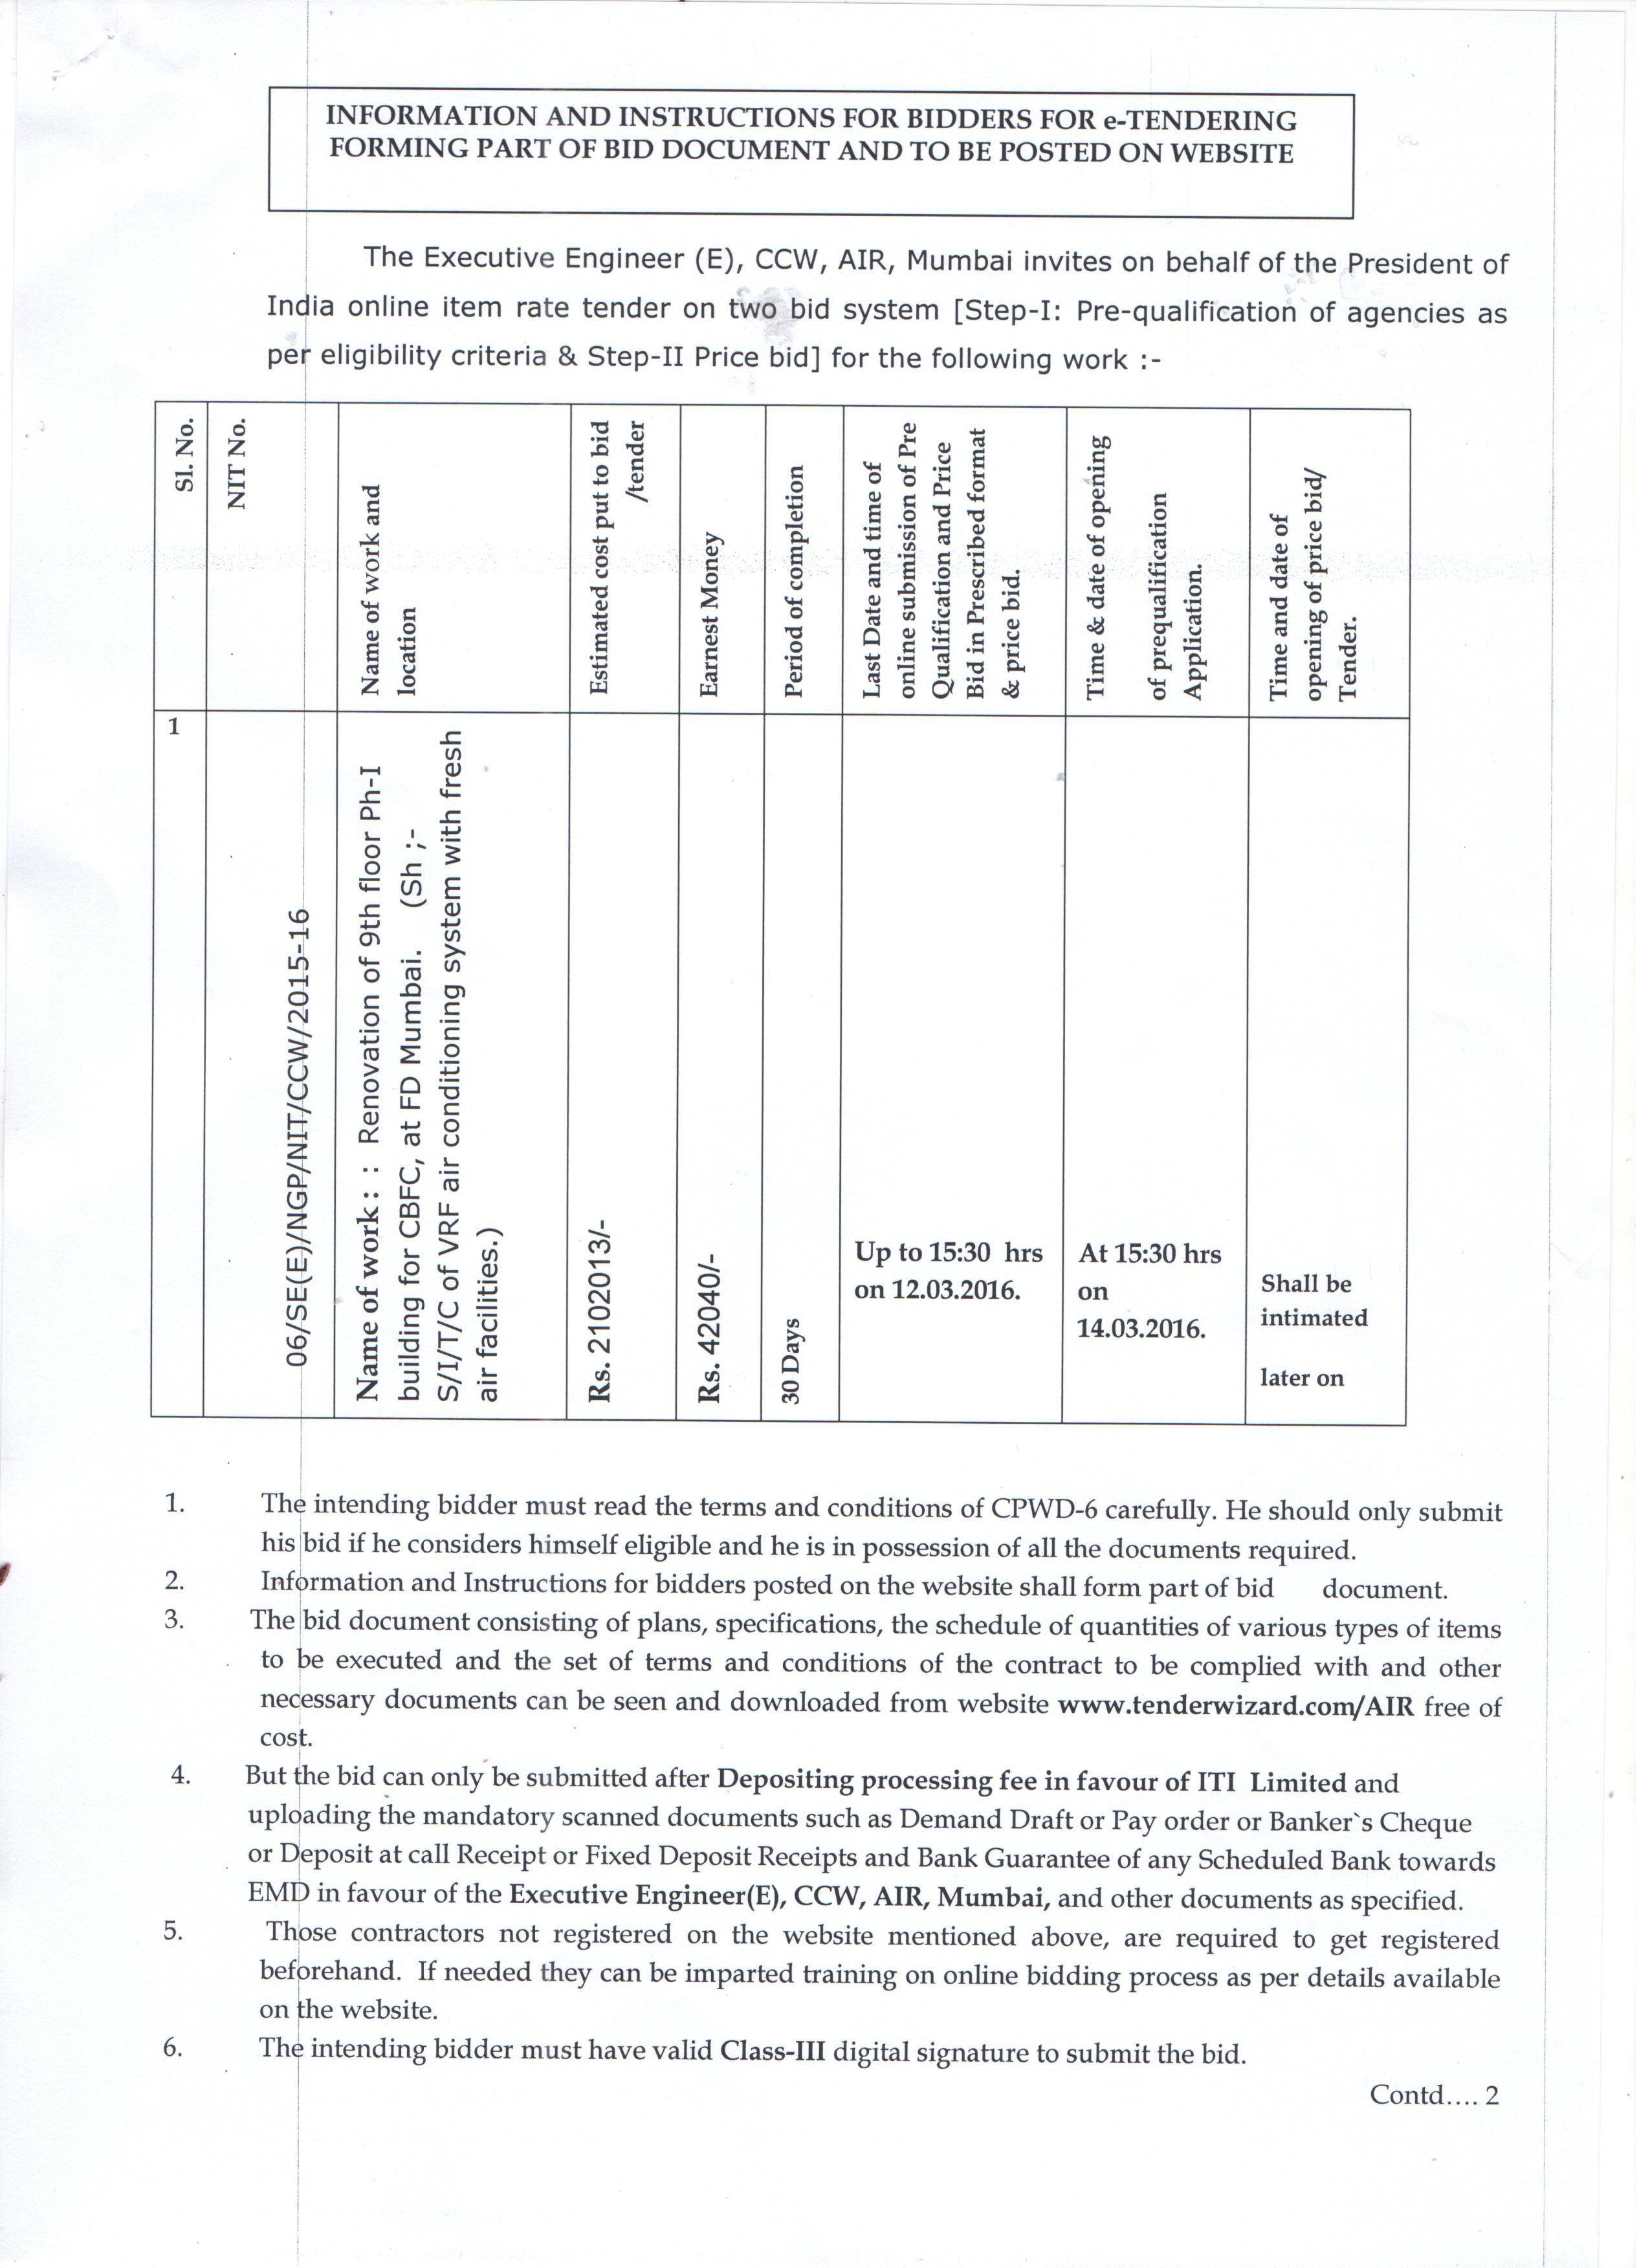 r r hardwood floors llc of ccw electrical regarding page 02